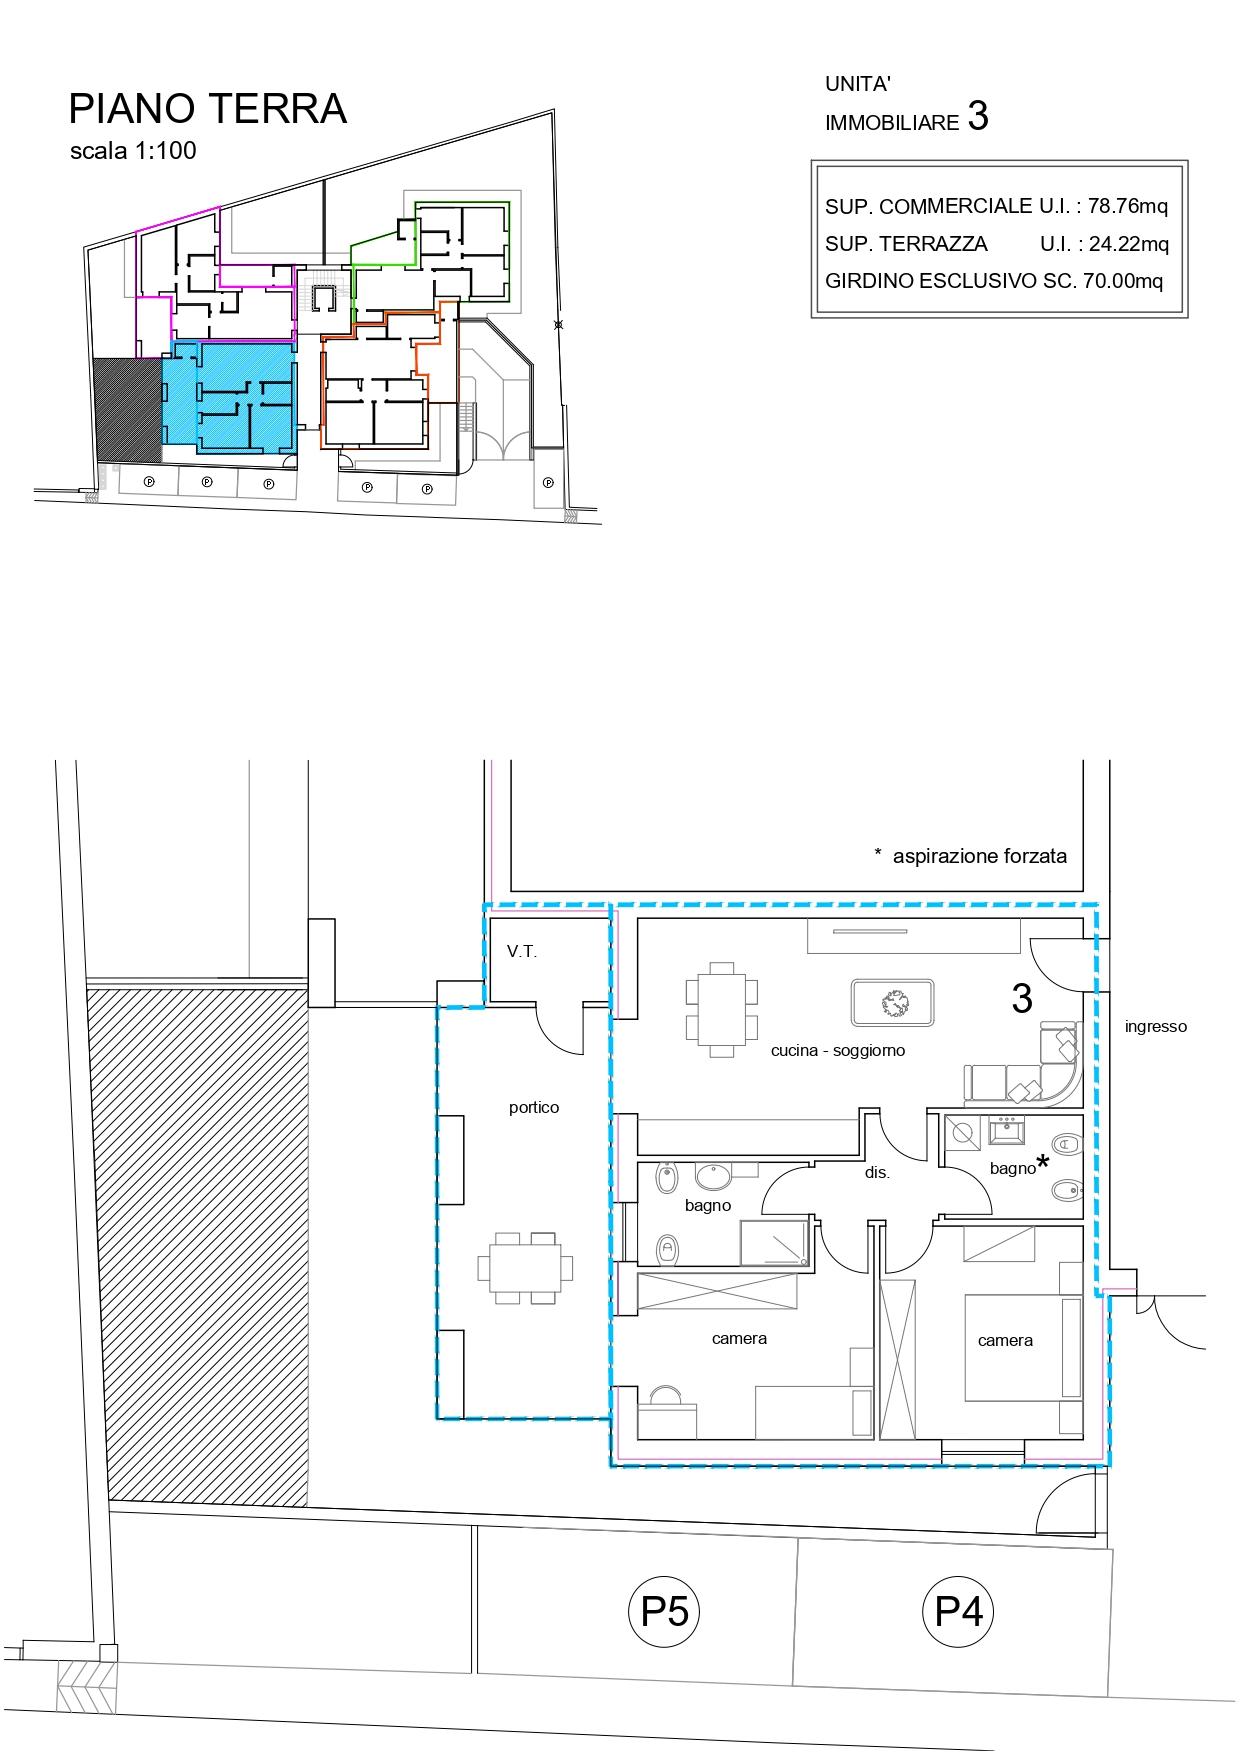 003_Appartamento 3_PT_page-0001